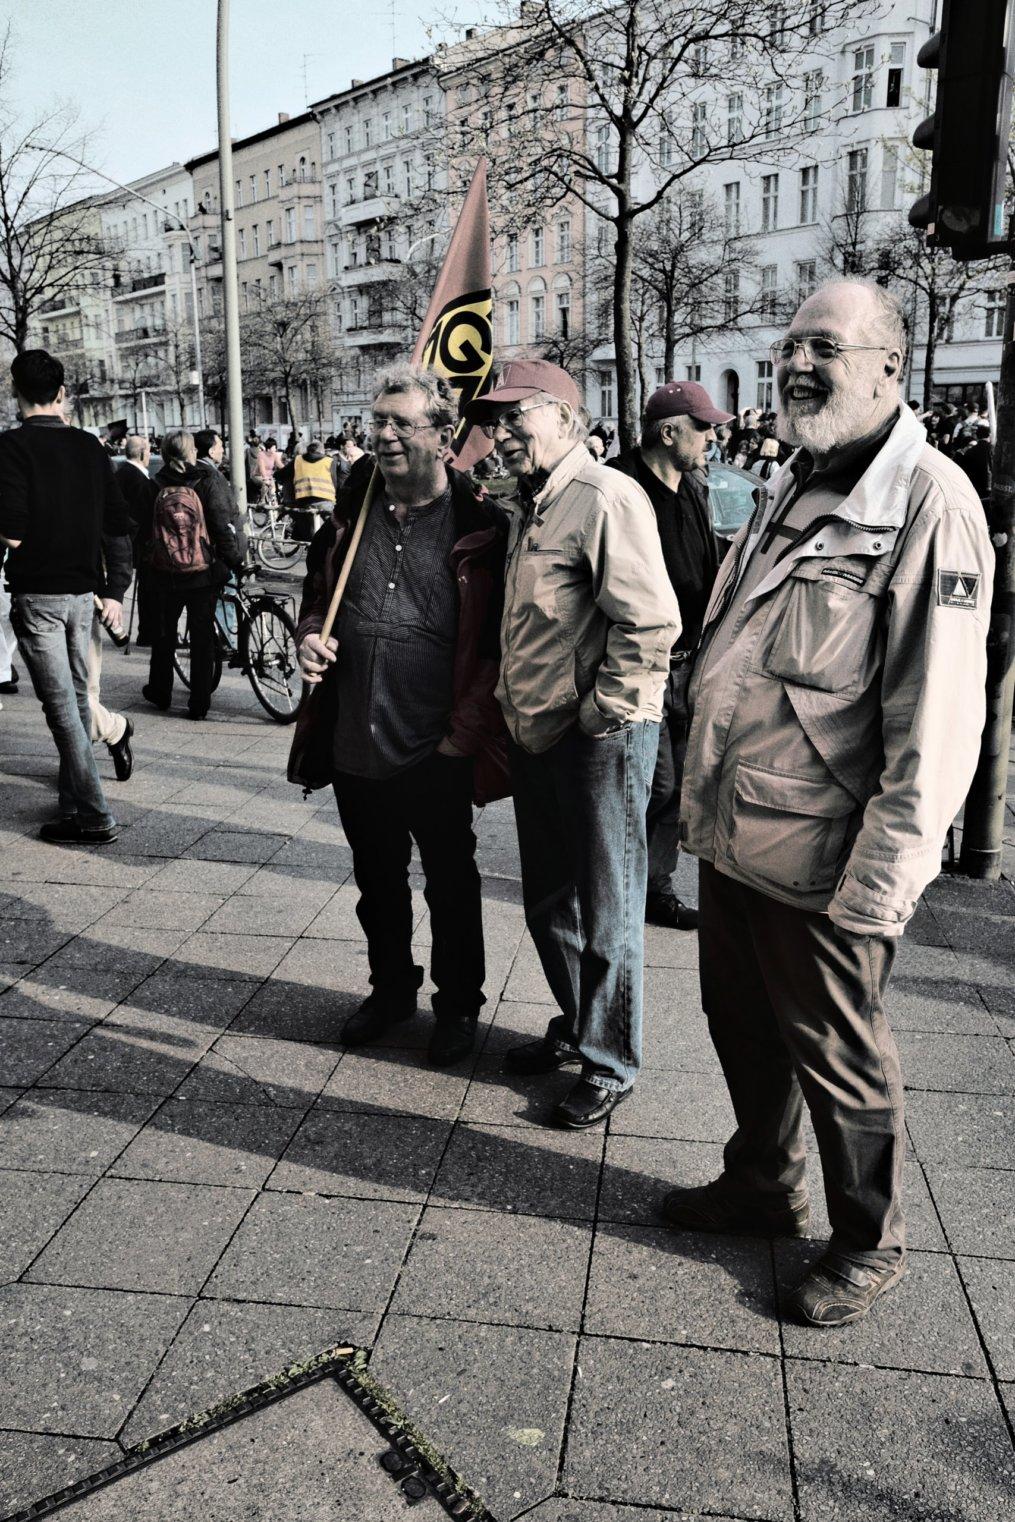 © Holger Kral • Photography - Gegen Mietwahnsinn - Berlin, Cityscape, Fujifilm X70, Germany, On my Doorstep - photo #7